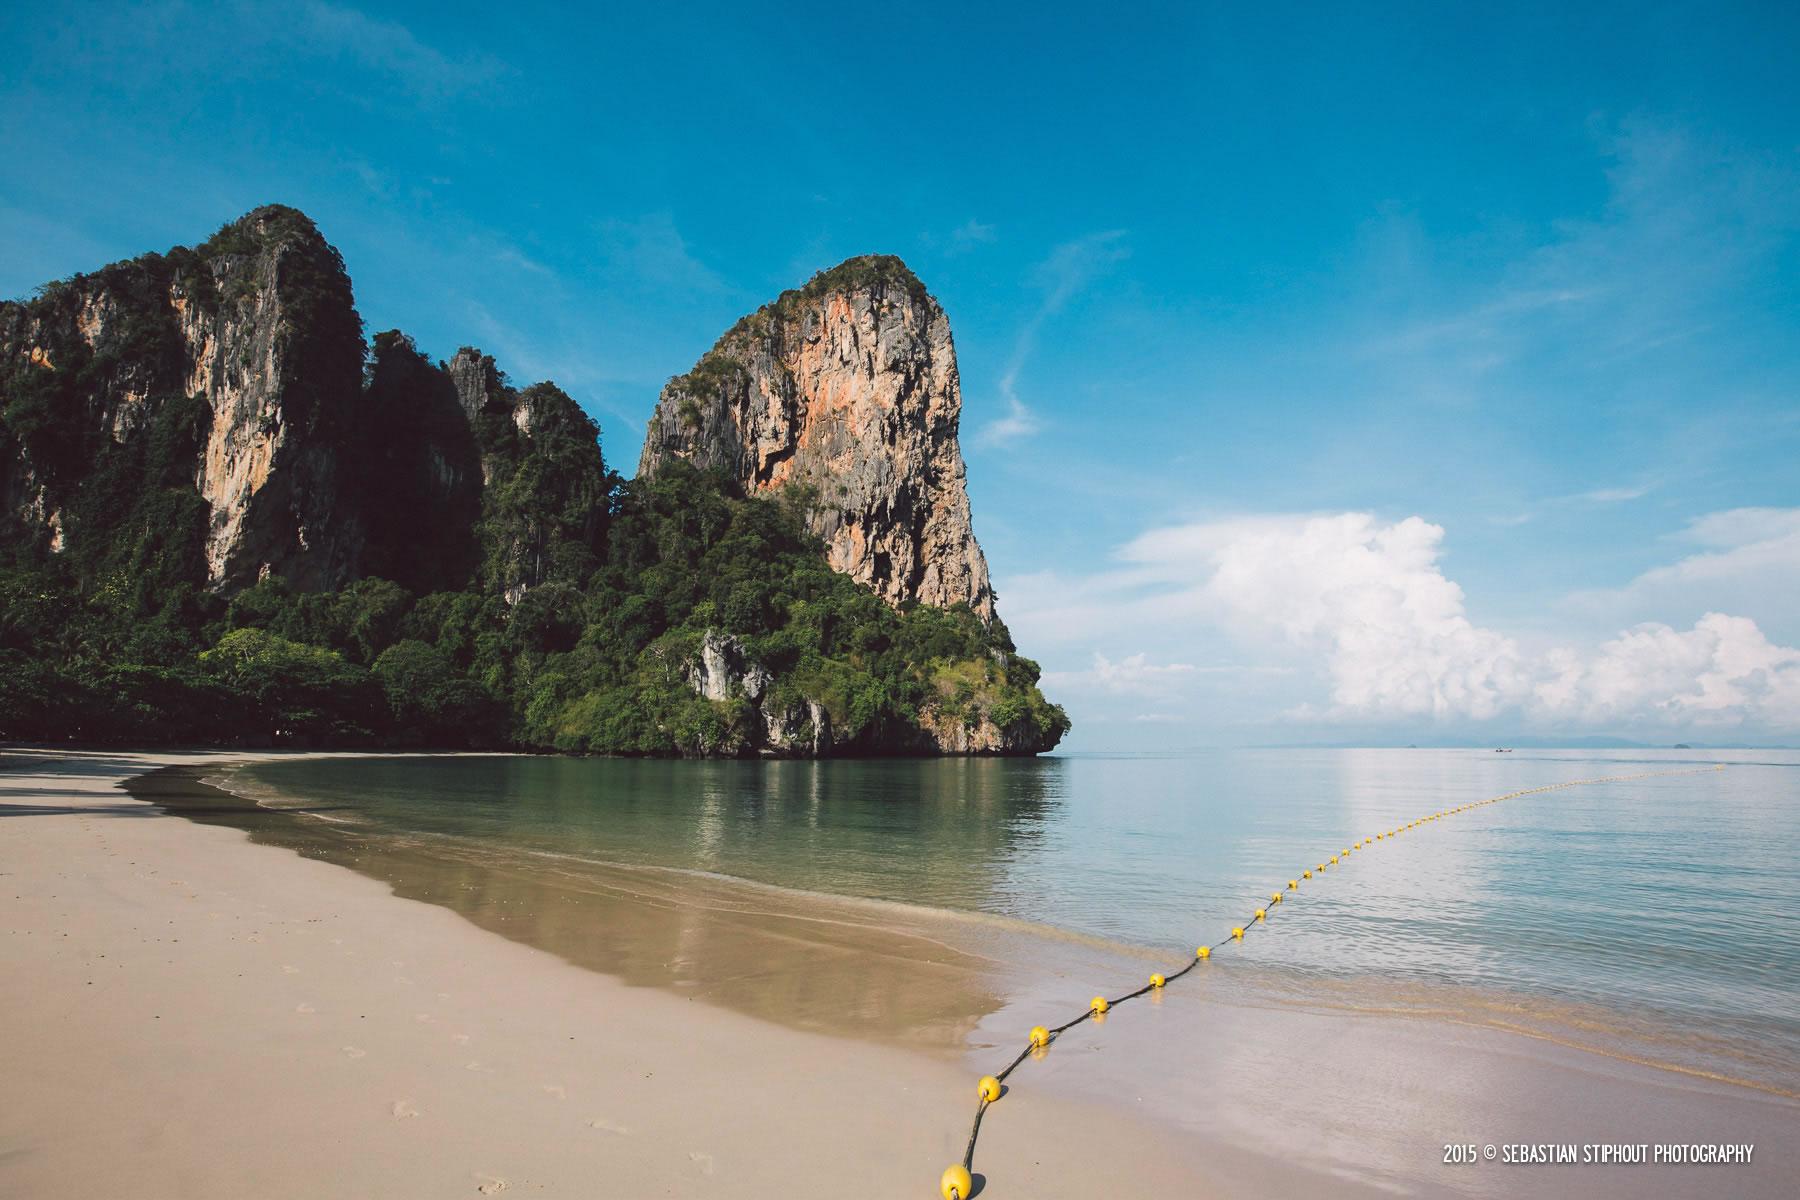 ST_may15-thailand-62